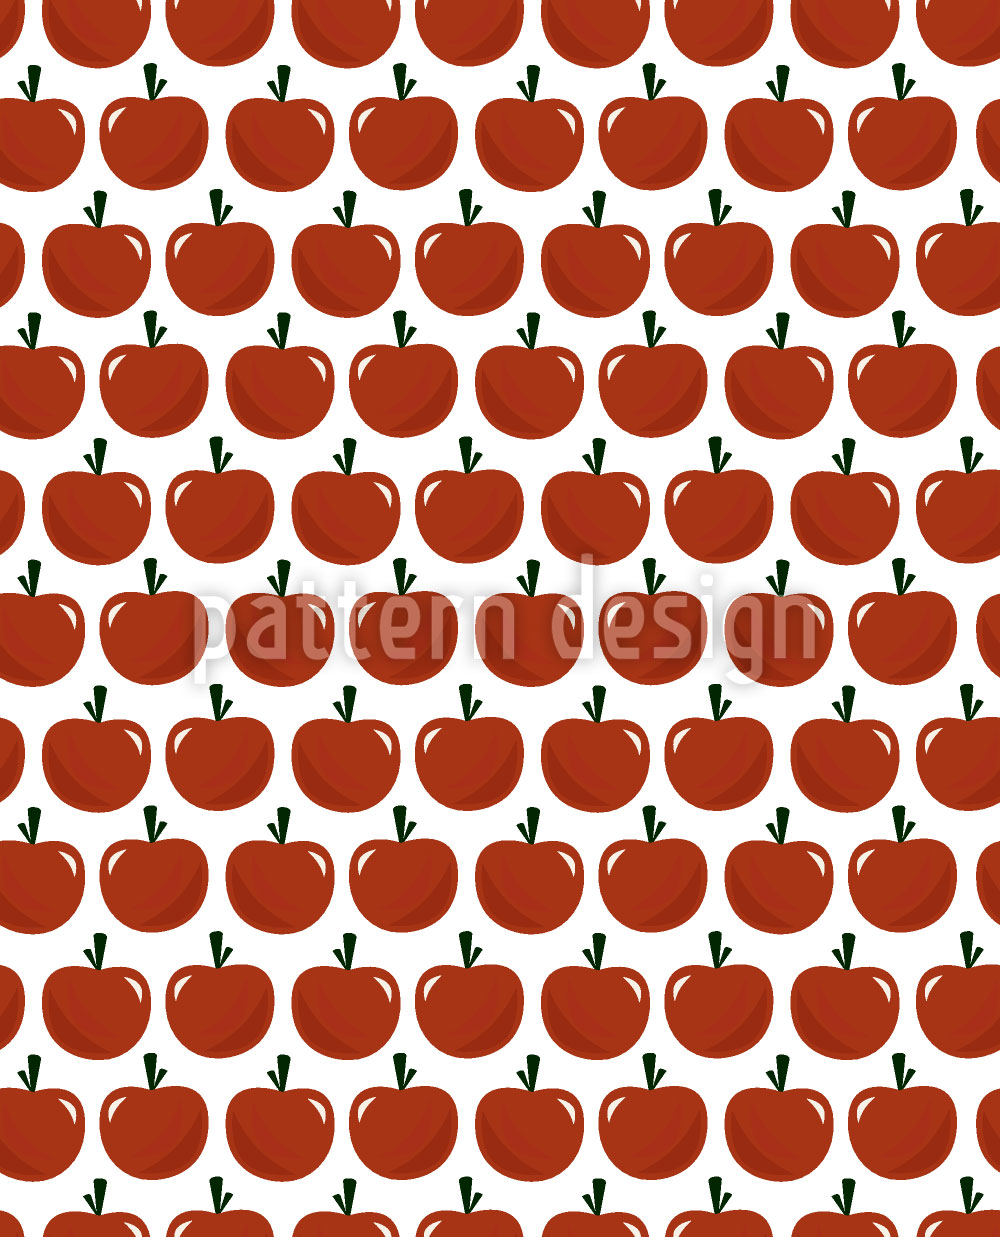 Designtapete Apfel Oder Tomate